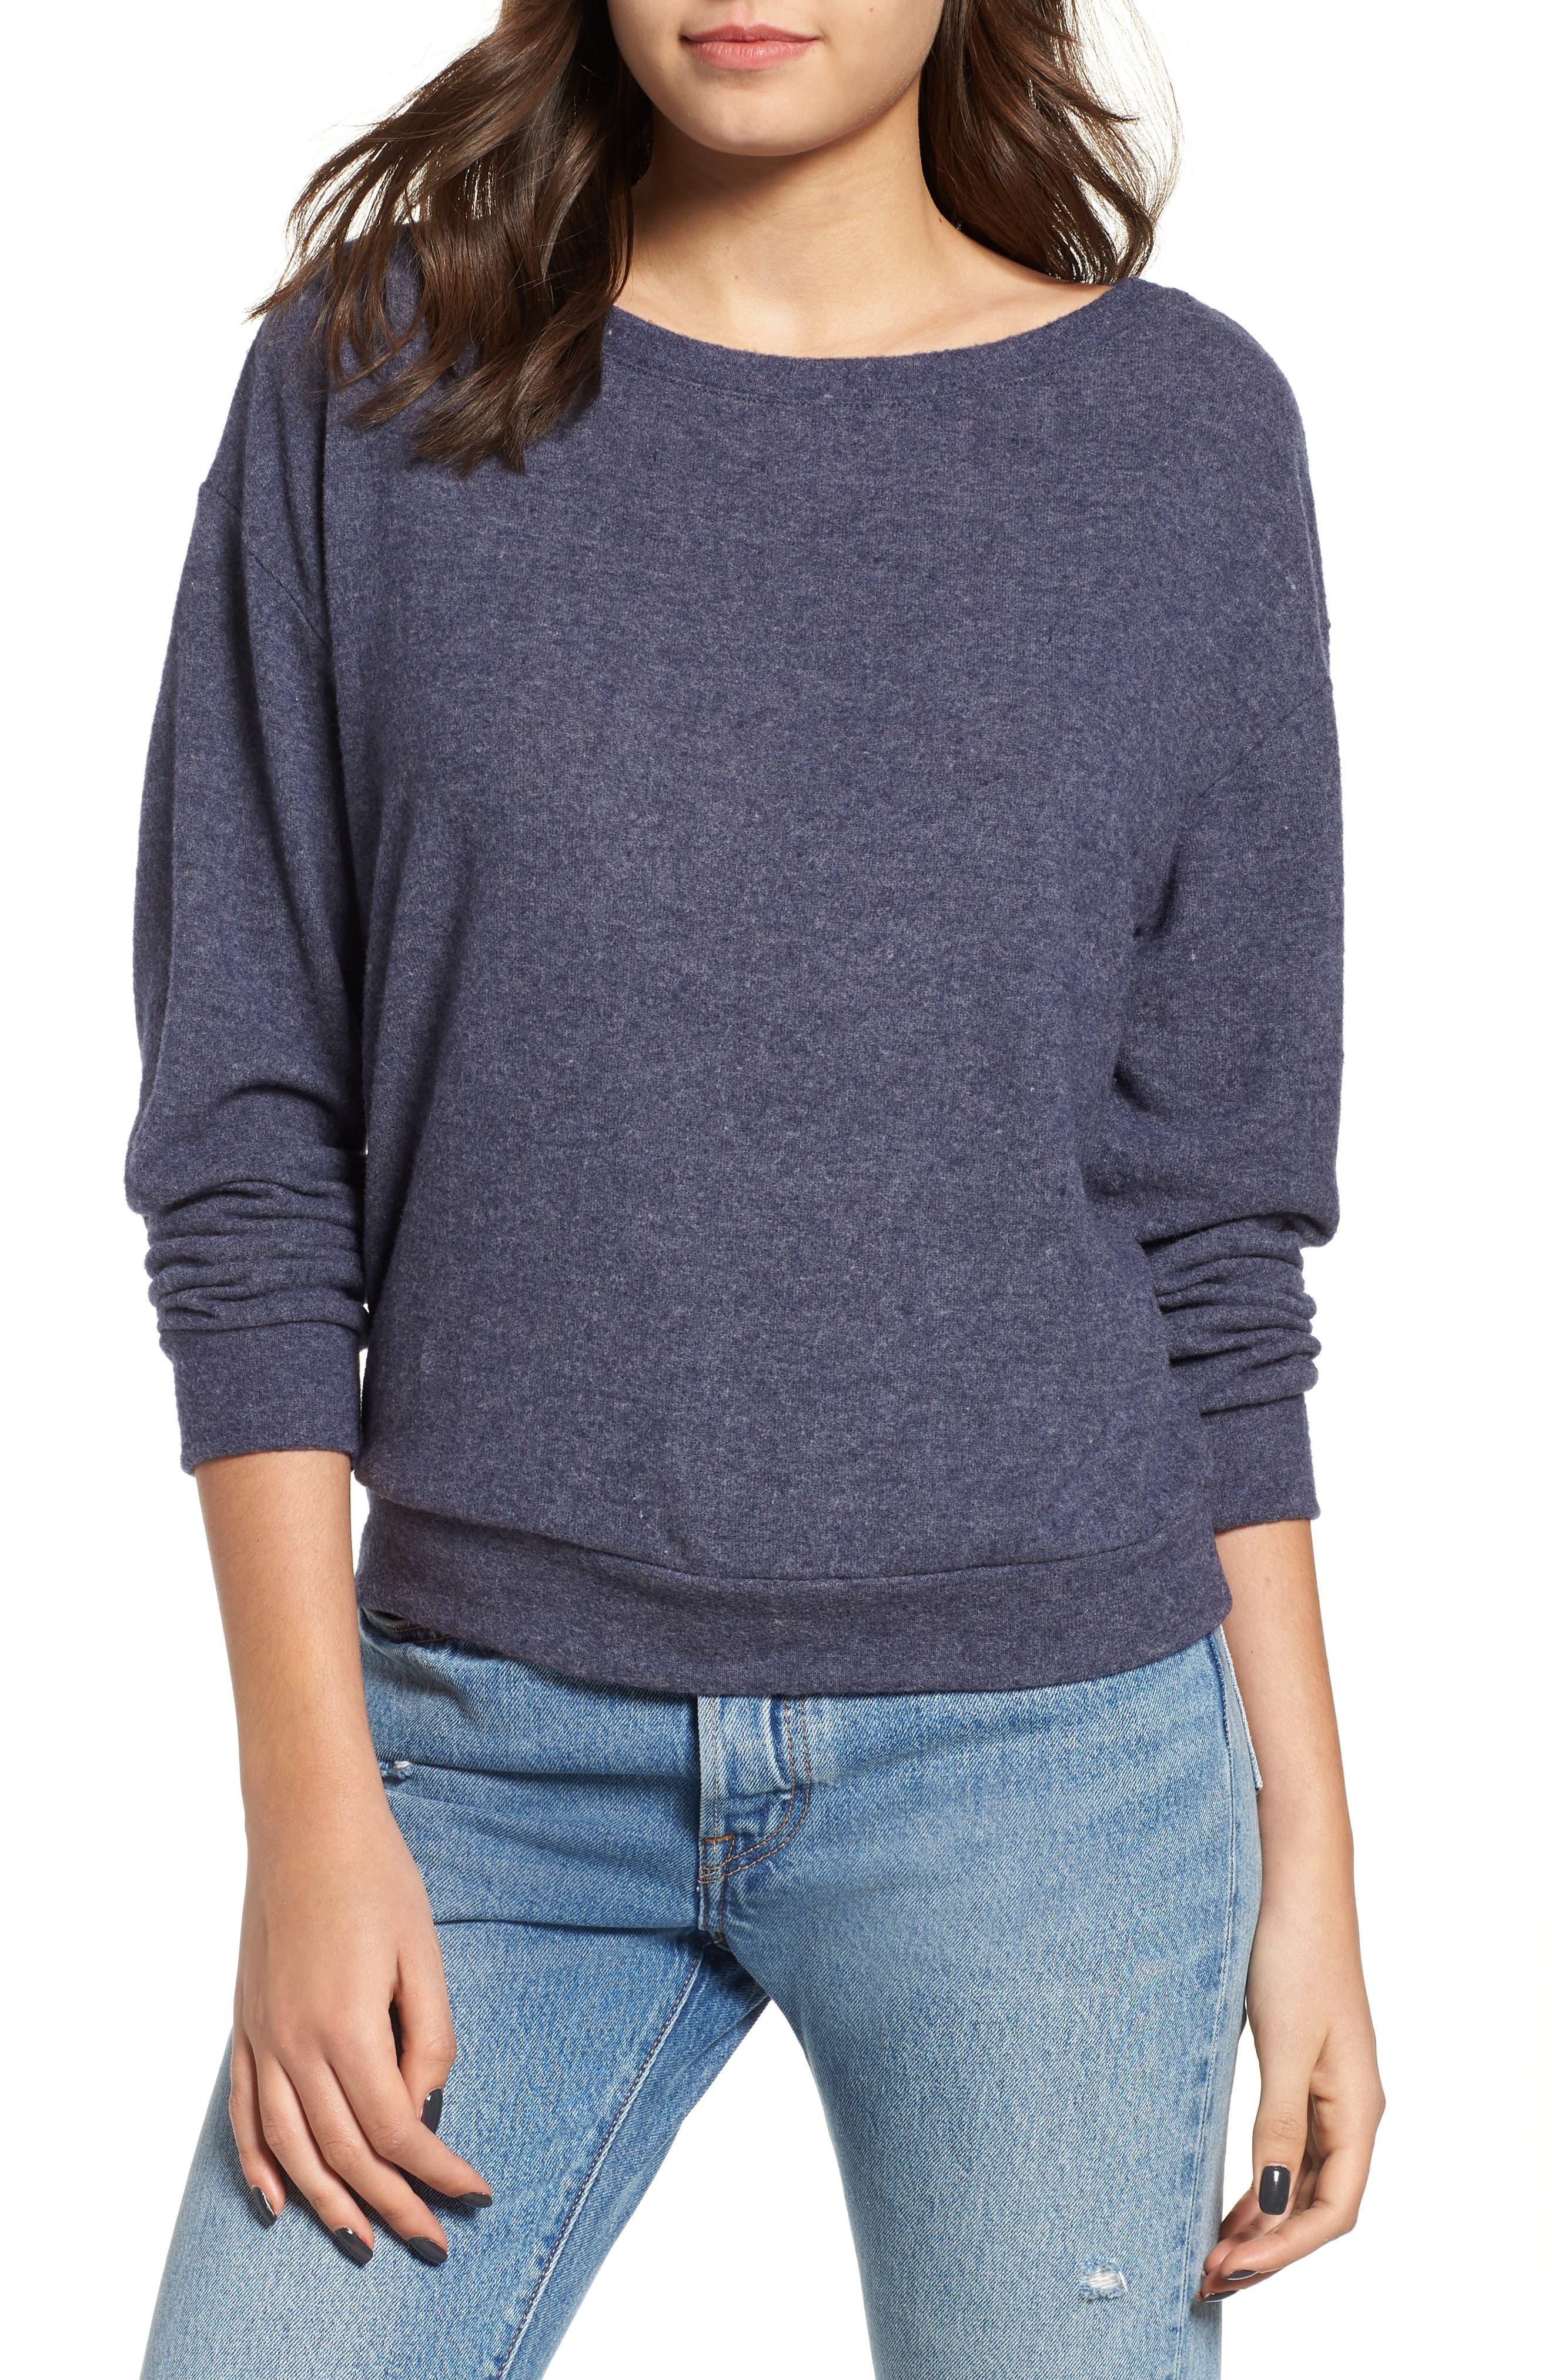 Keys Sweatshirt,                             Main thumbnail 1, color,                             HEATHER NAVY